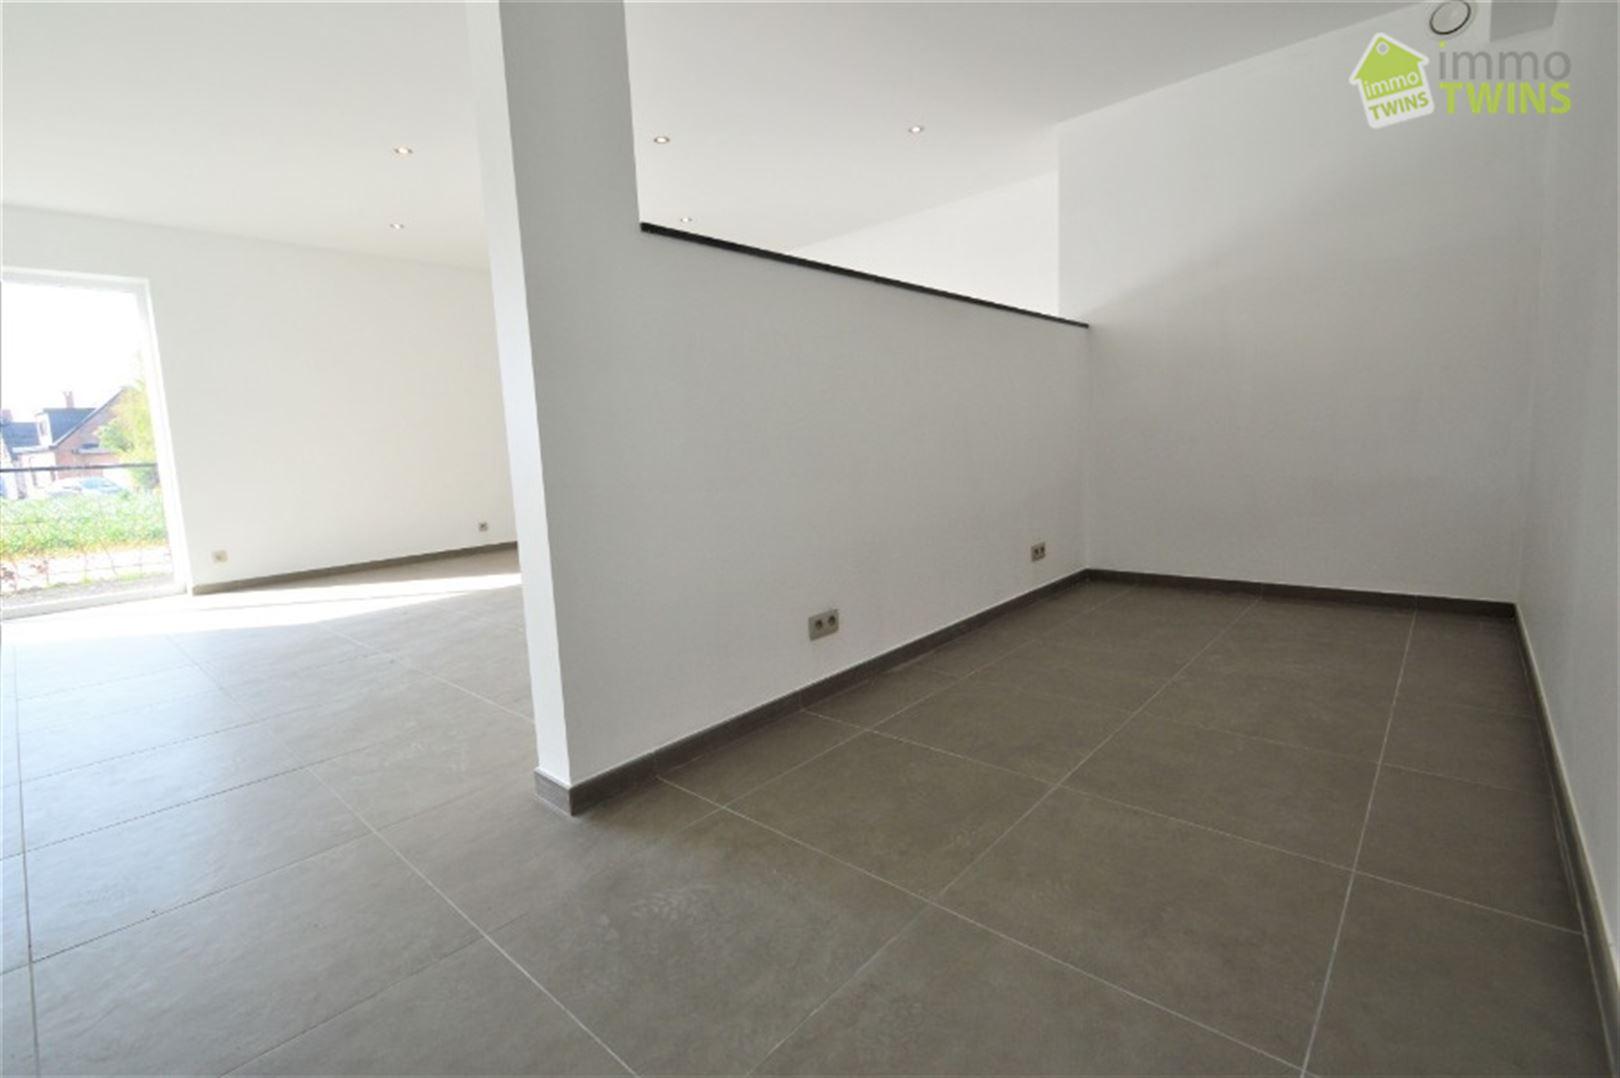 Foto 7 : Woning te 9200 Sint-Gillis-bij-Dendermonde (België) - Prijs € 999